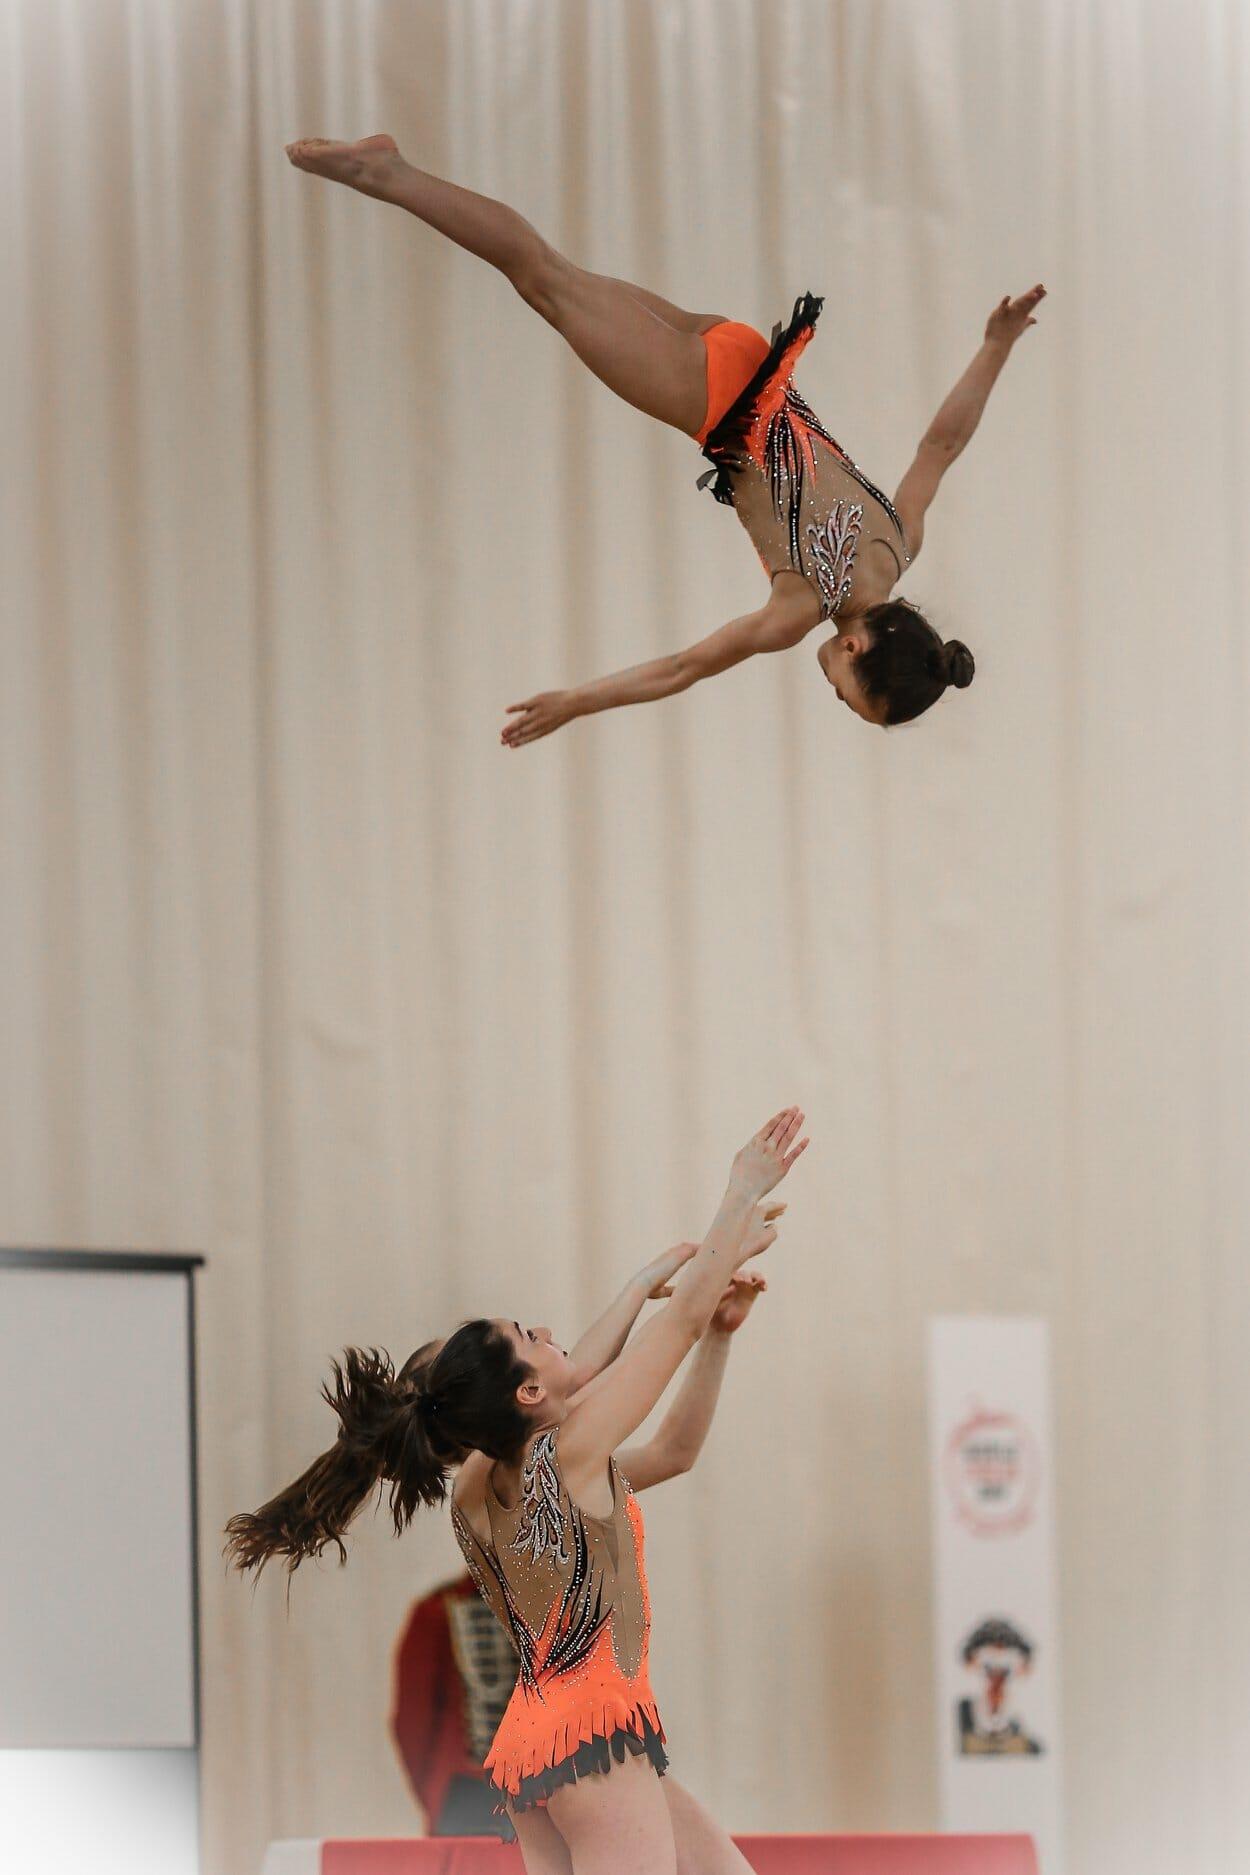 World Circus day in Monaco